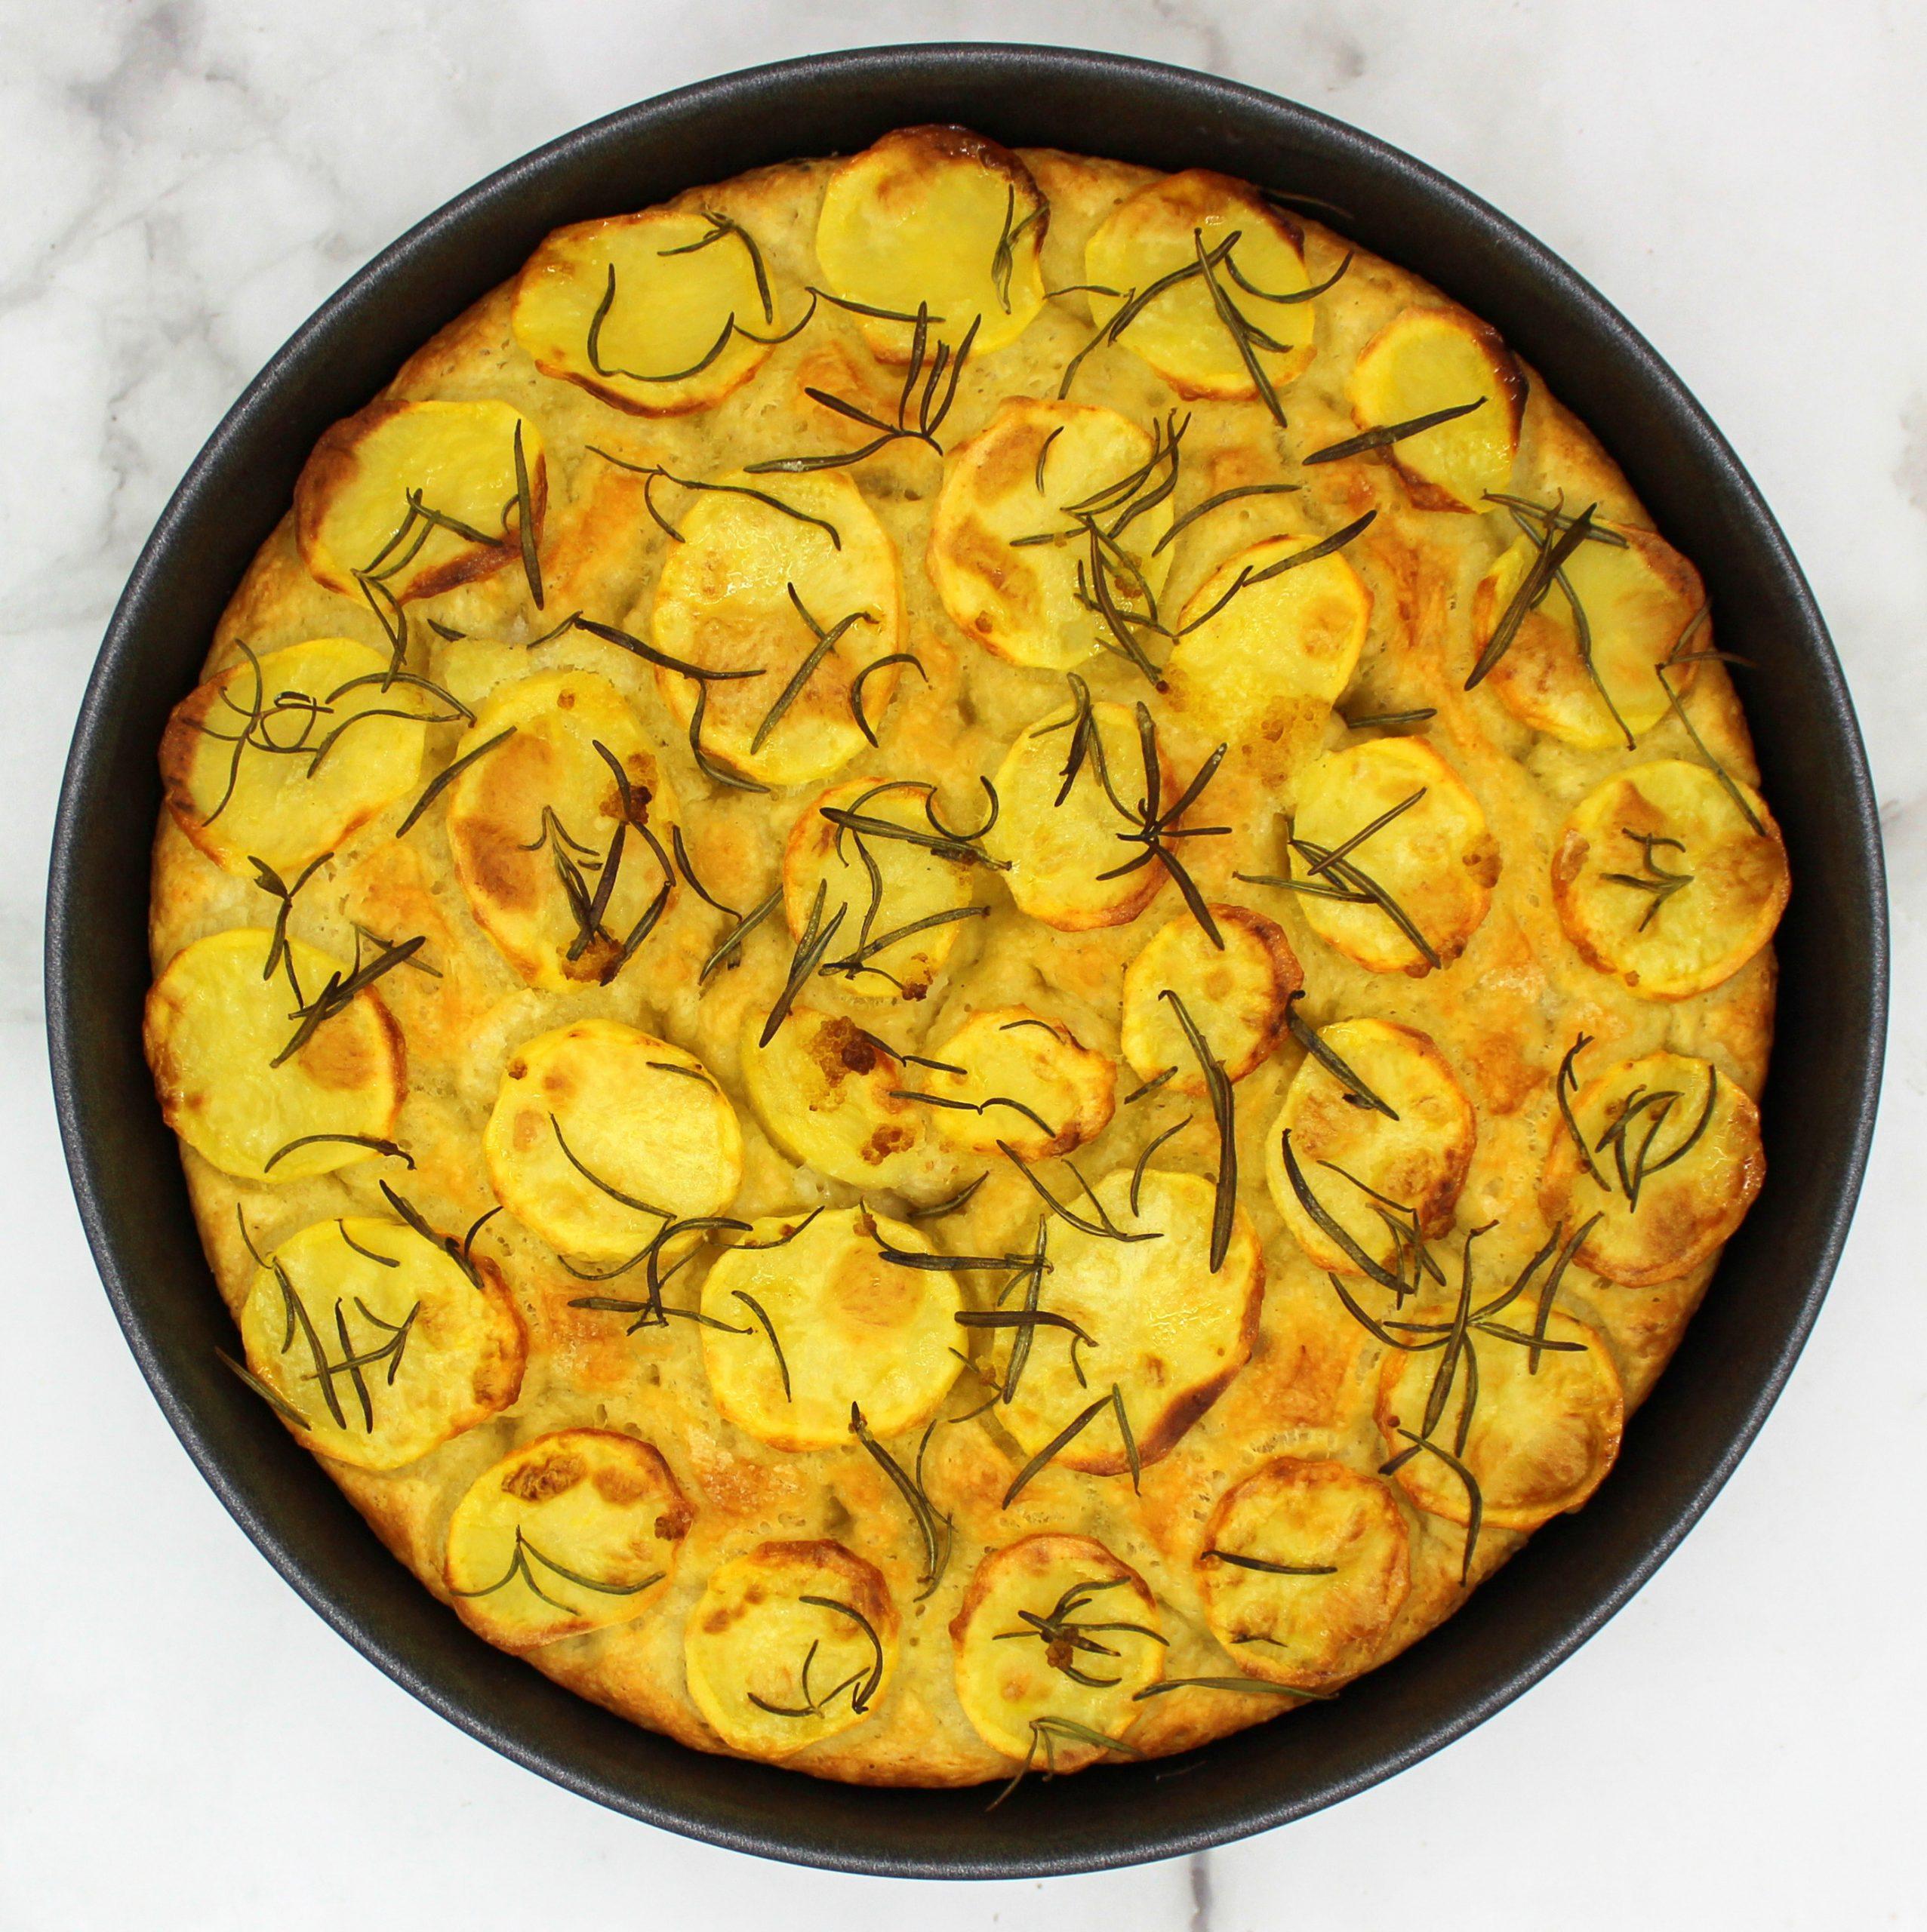 Italian Focaccia with potatoes and rosemary